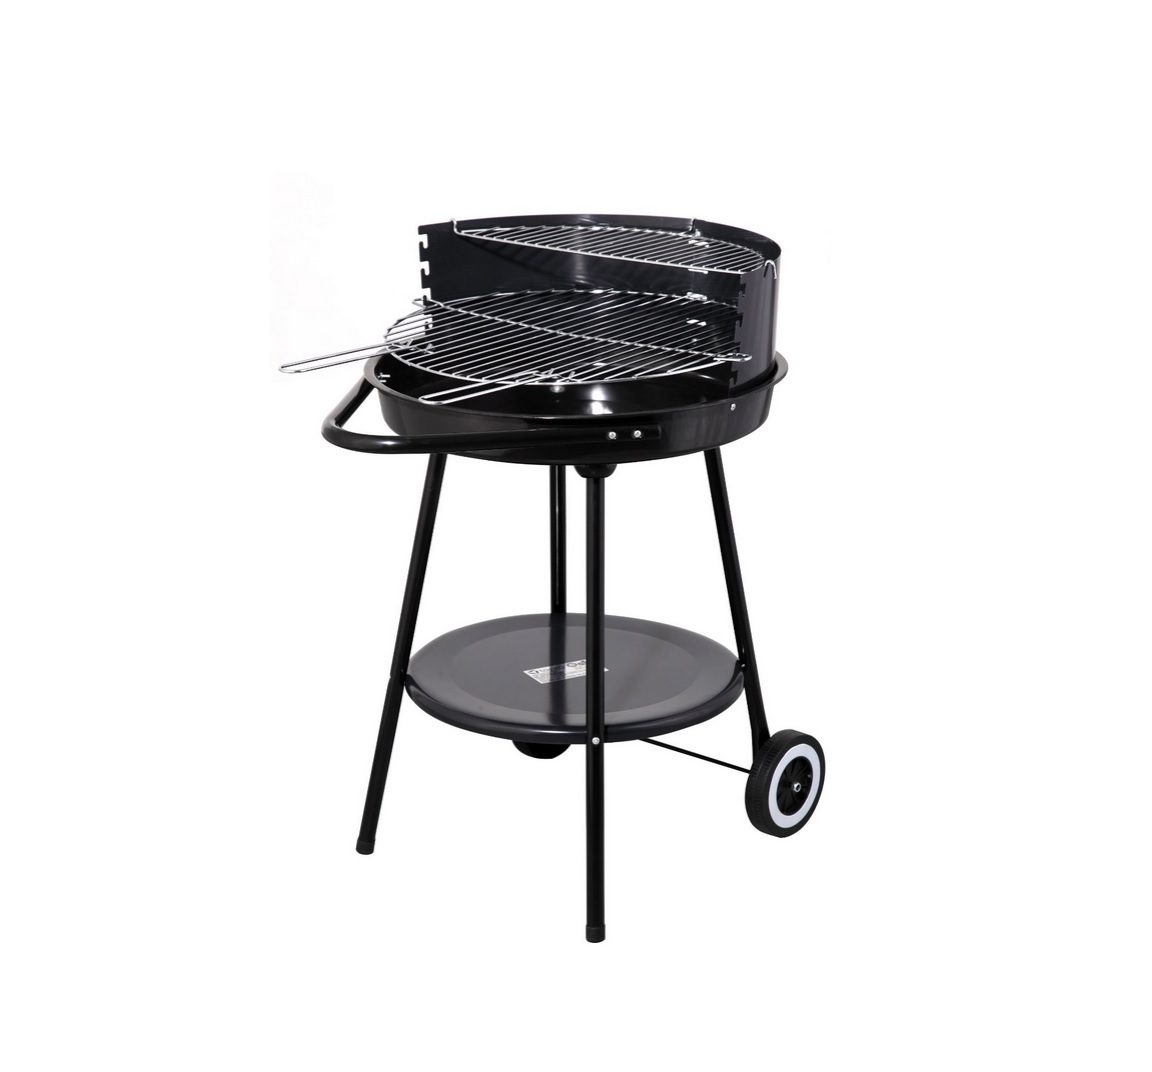 Tepro round grill highland